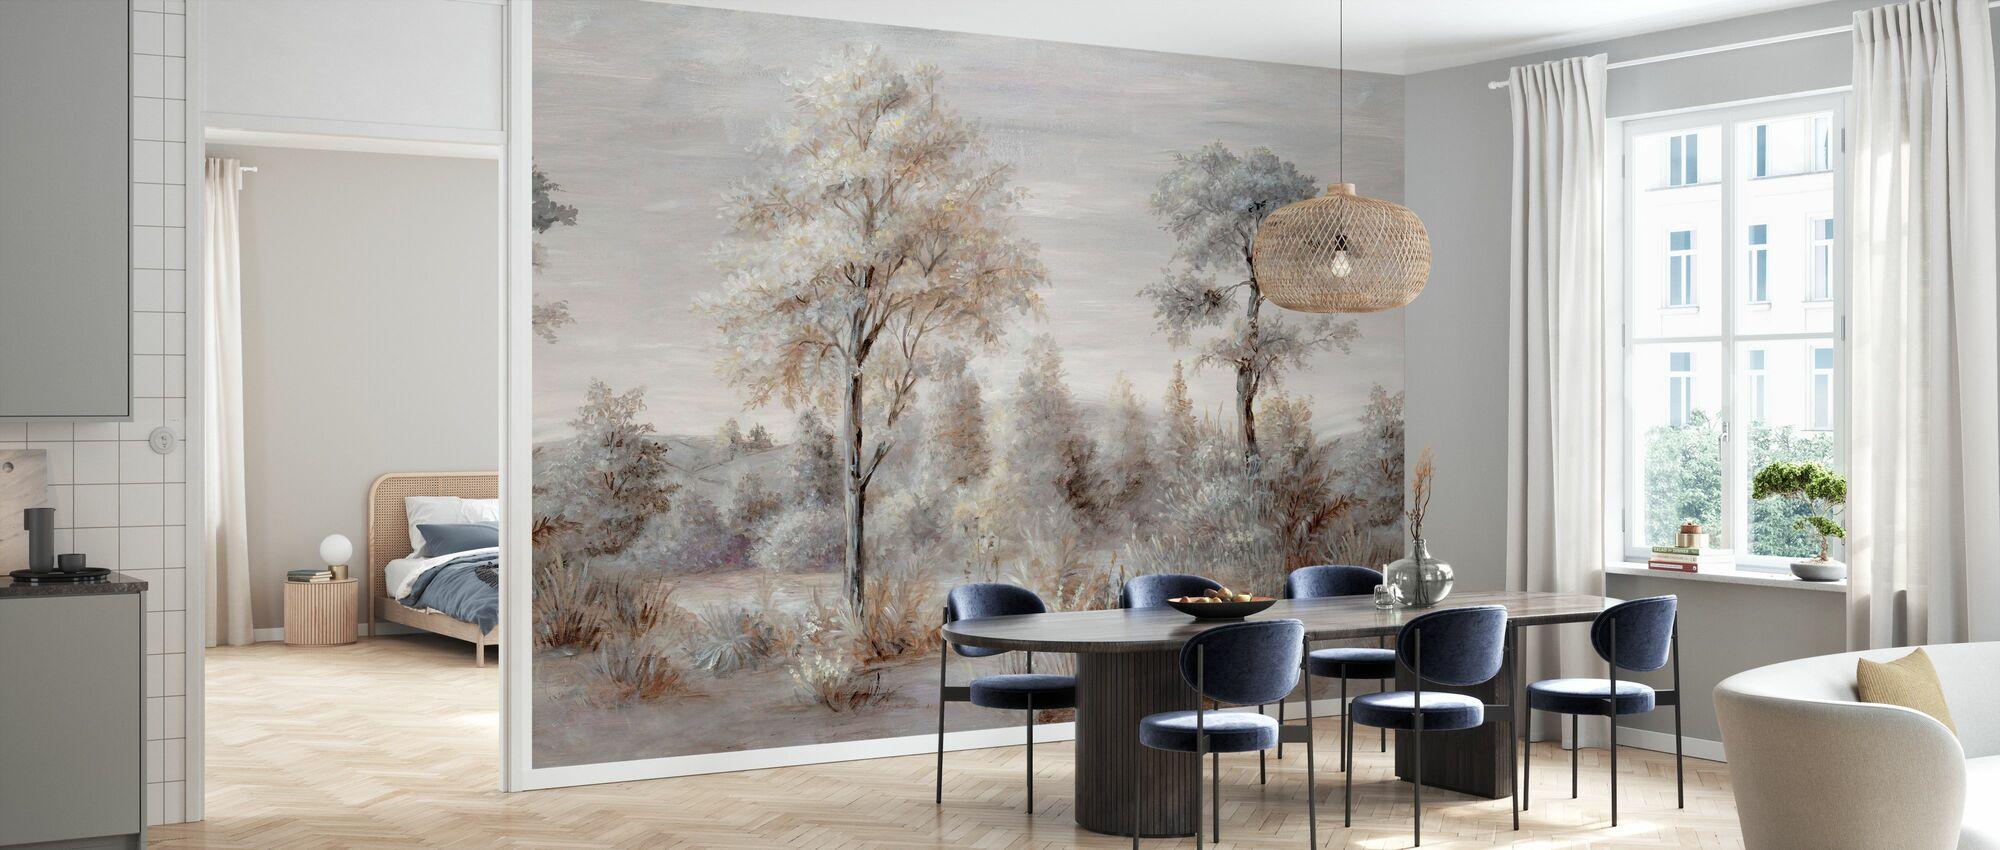 Expressive View - Wallpaper - Kitchen